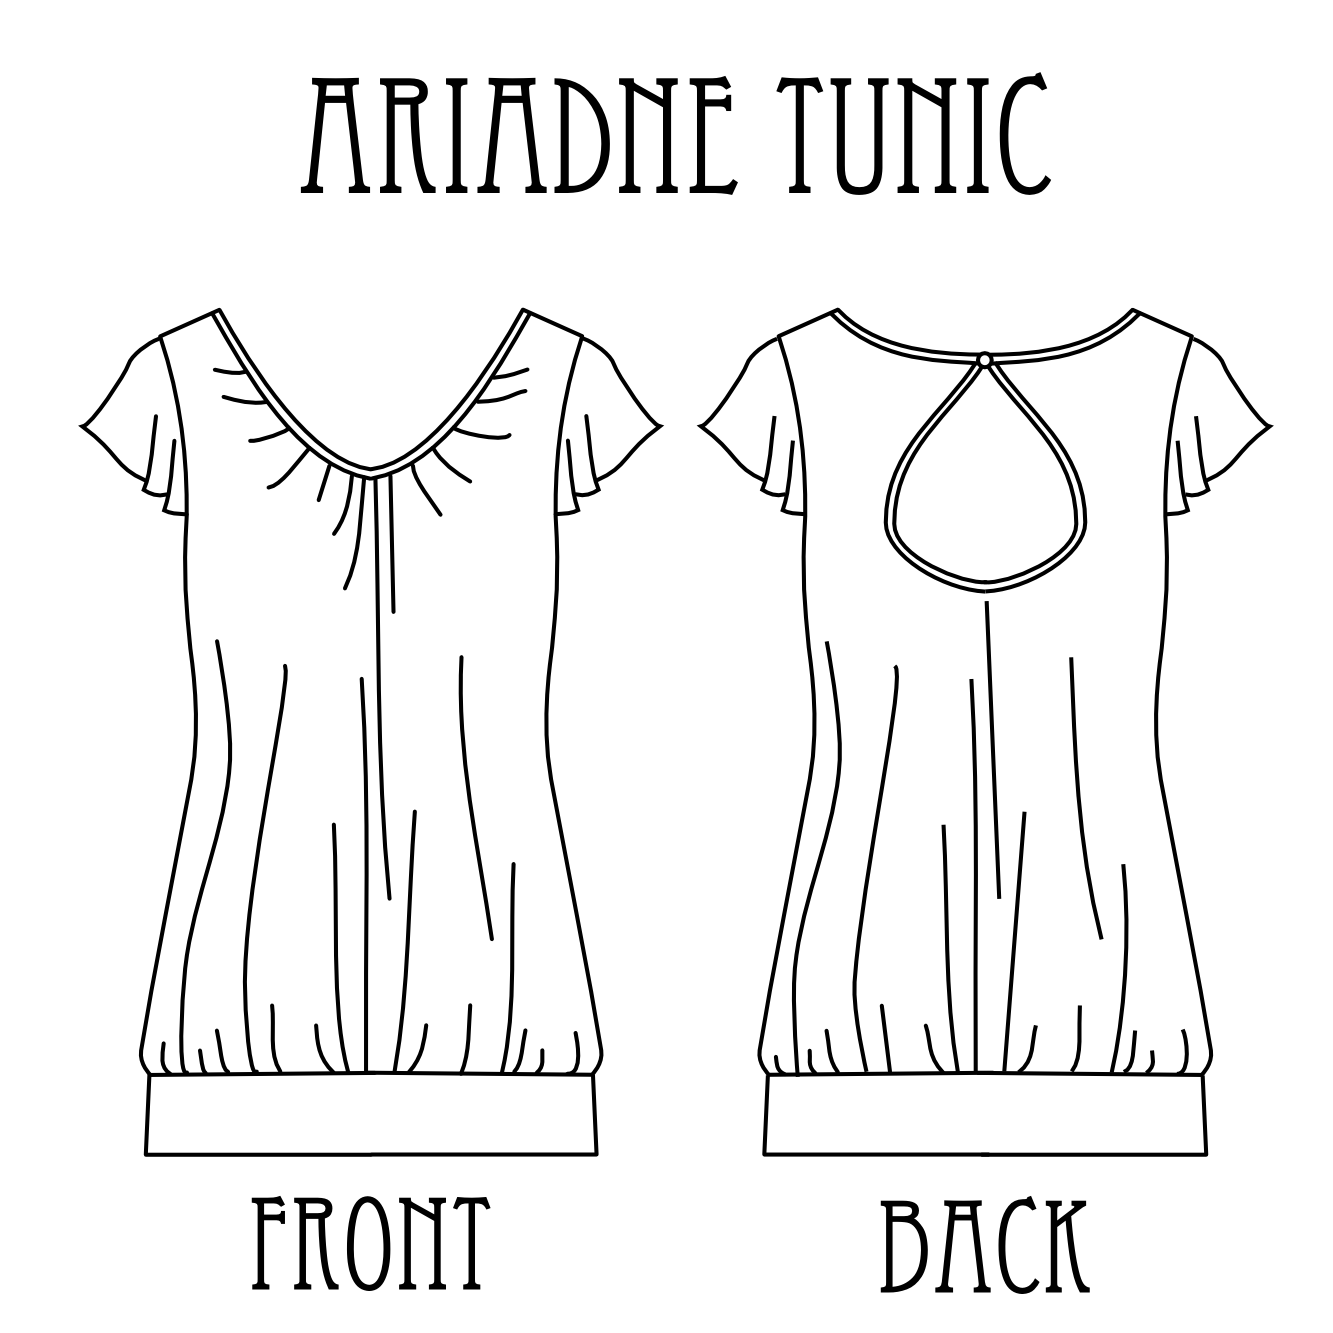 Anleitung und Schnittmuster Ariadne Tunic   Nähen   Pinterest ...